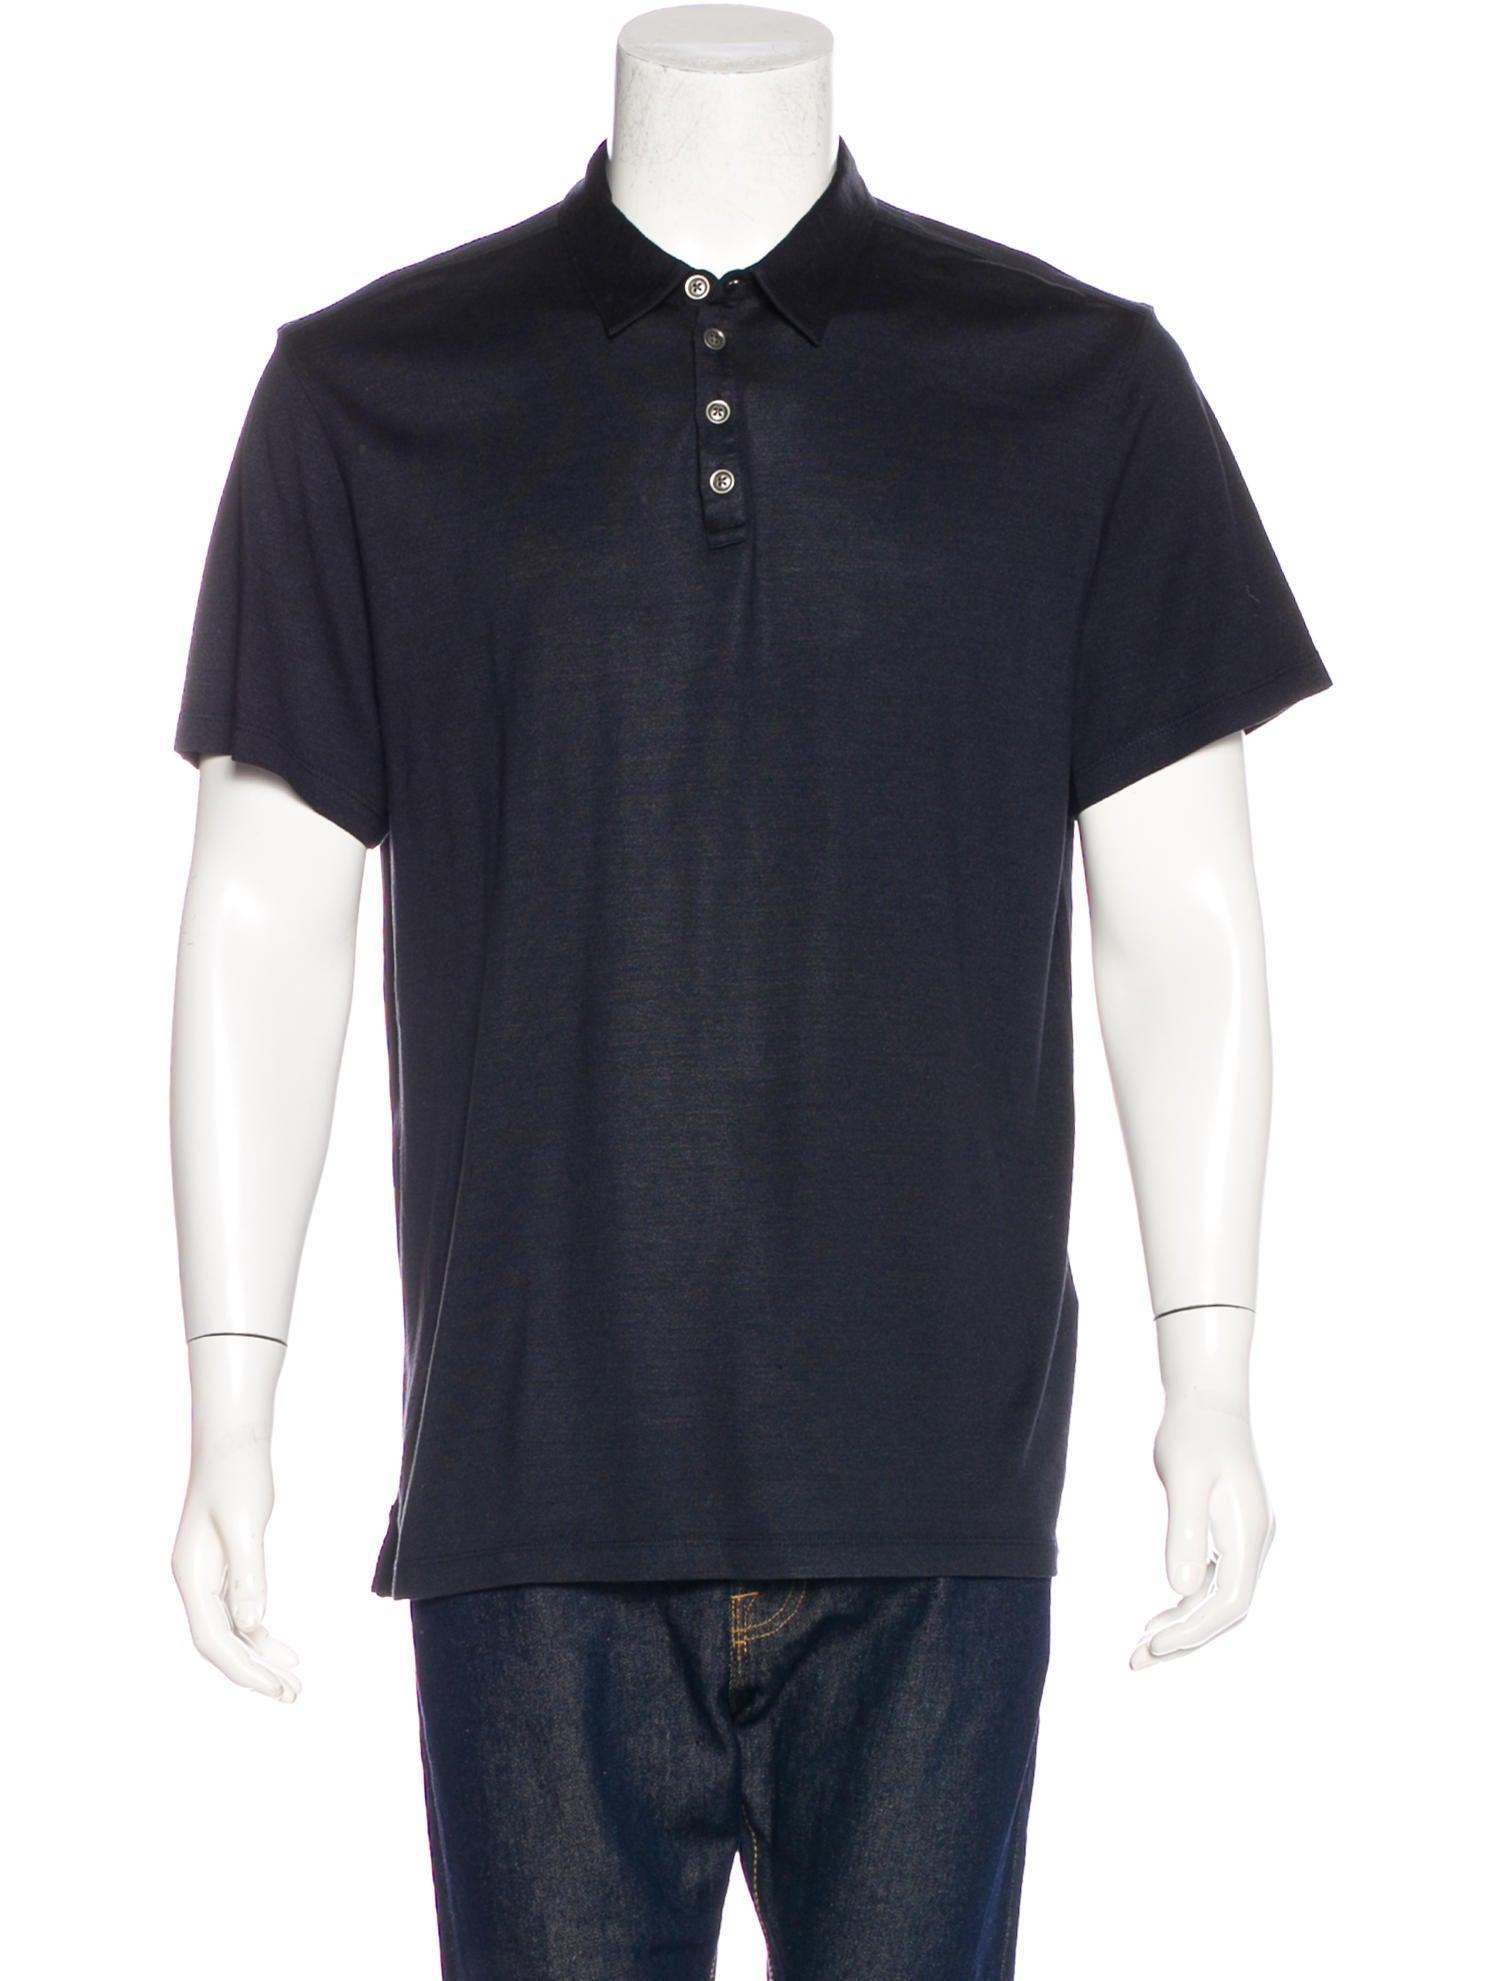 John Varvatos Silk Blend Polo Shirt Clothing Jva24125